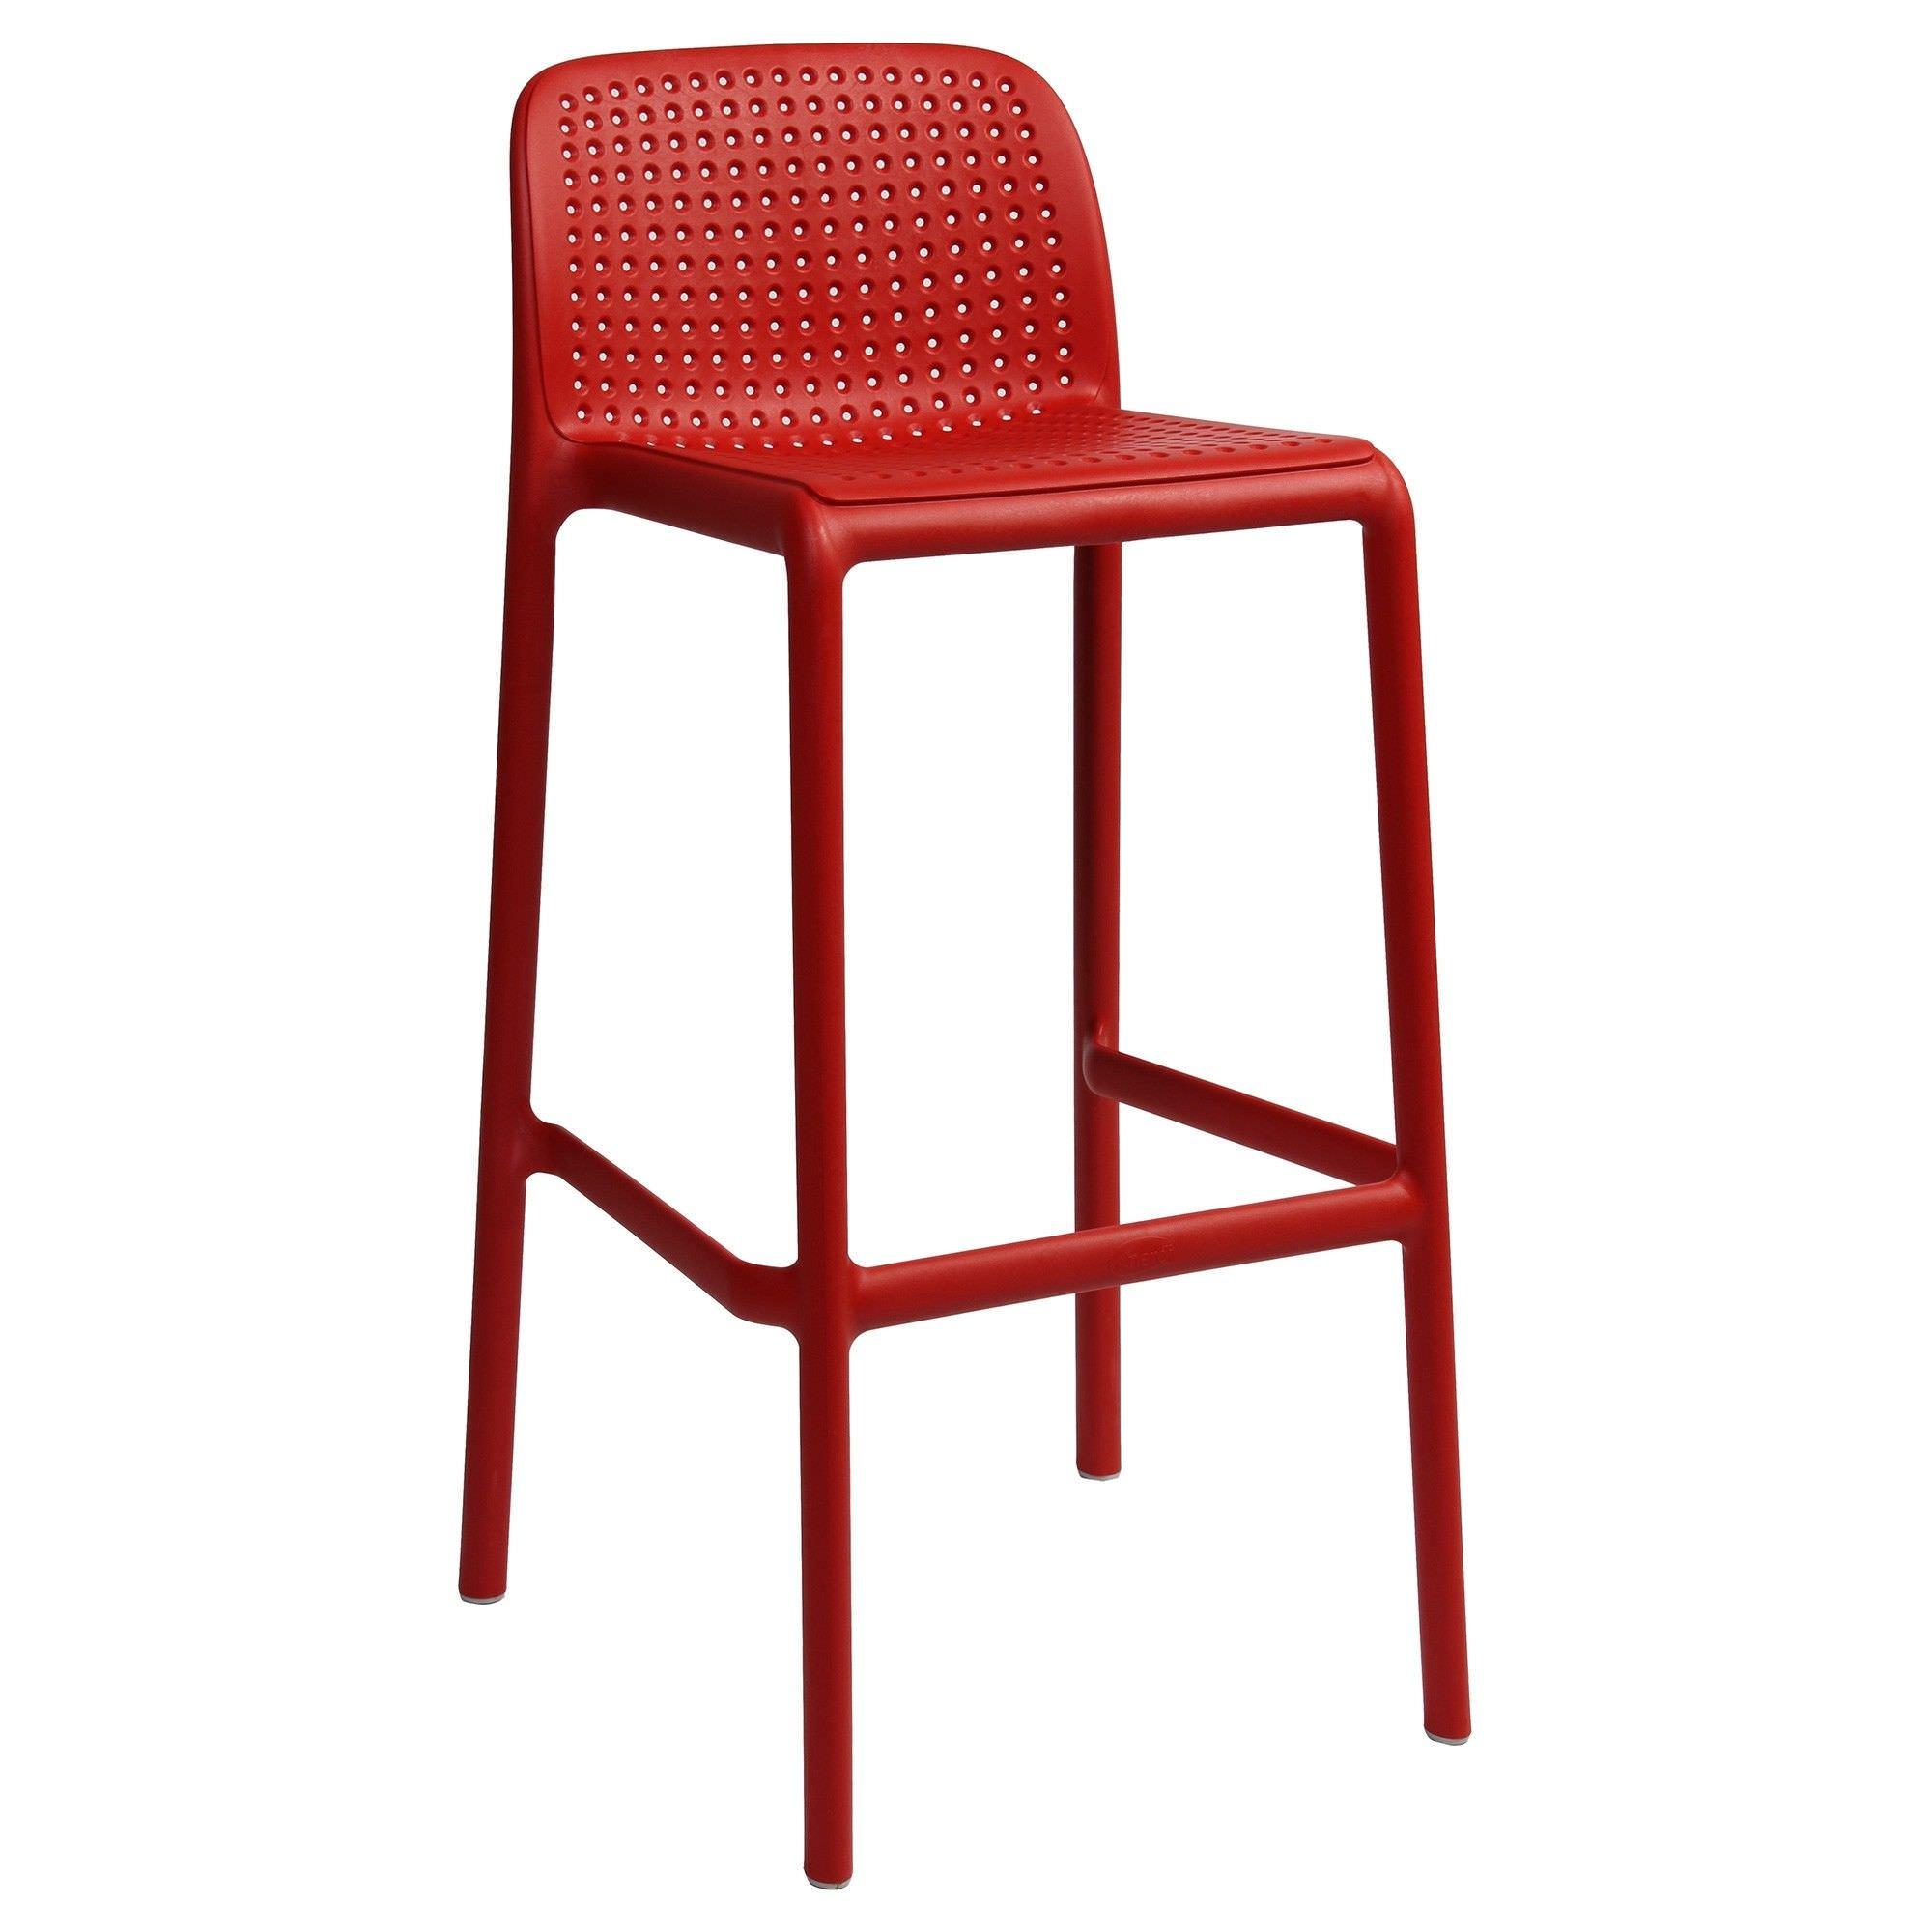 Bora Italian Made Commercial Grade Stackable Indoor/Outdoor Bar Stool , Red